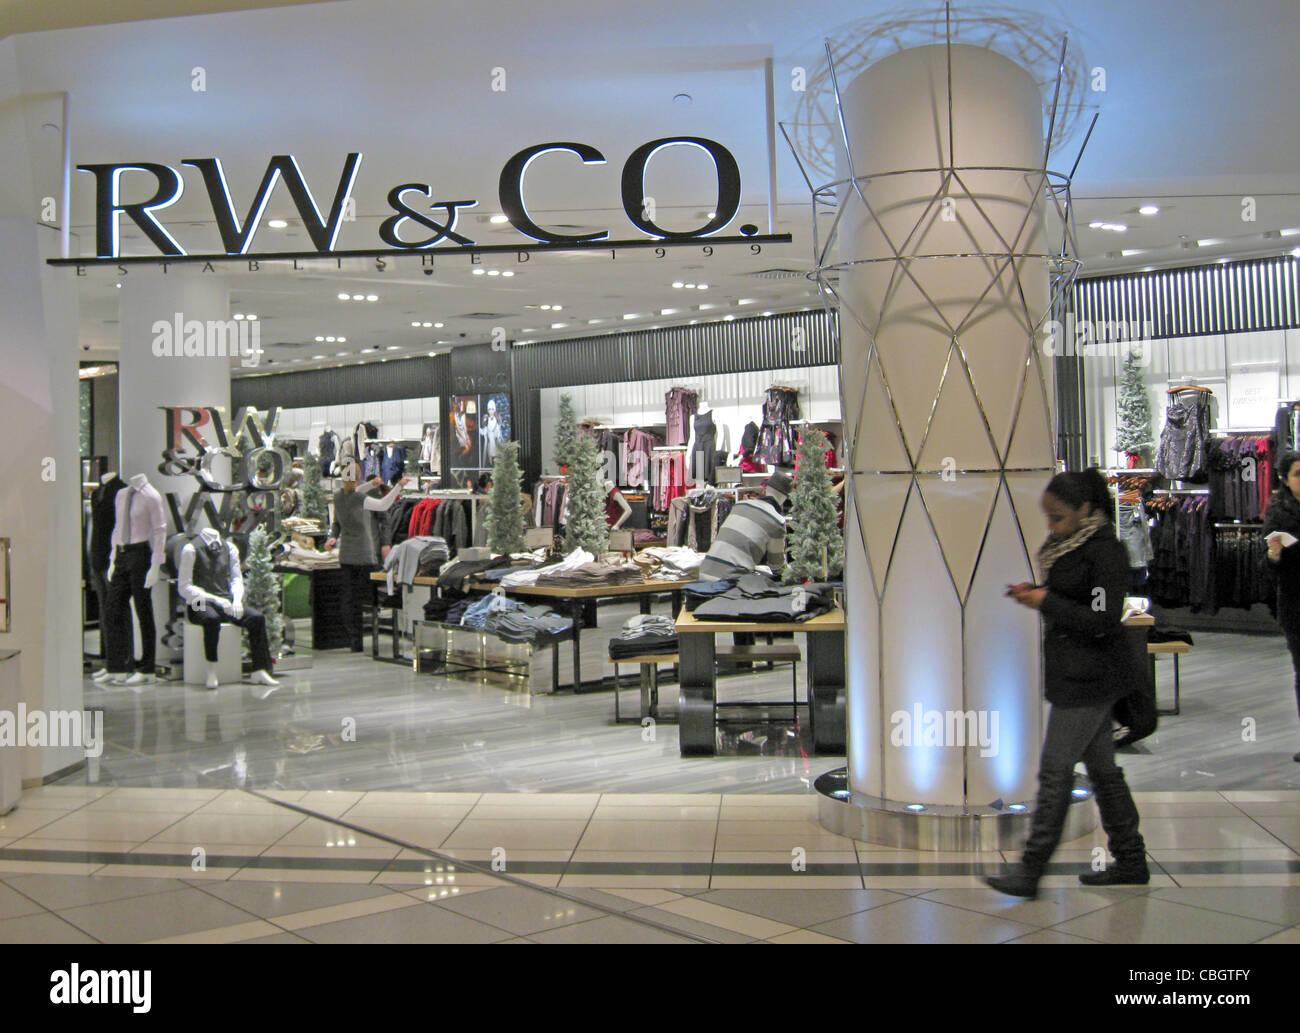 RW & CO sore in the Eaton Centre shopping mall in Toronto, Canada. Photo Tony Gale - Stock Image